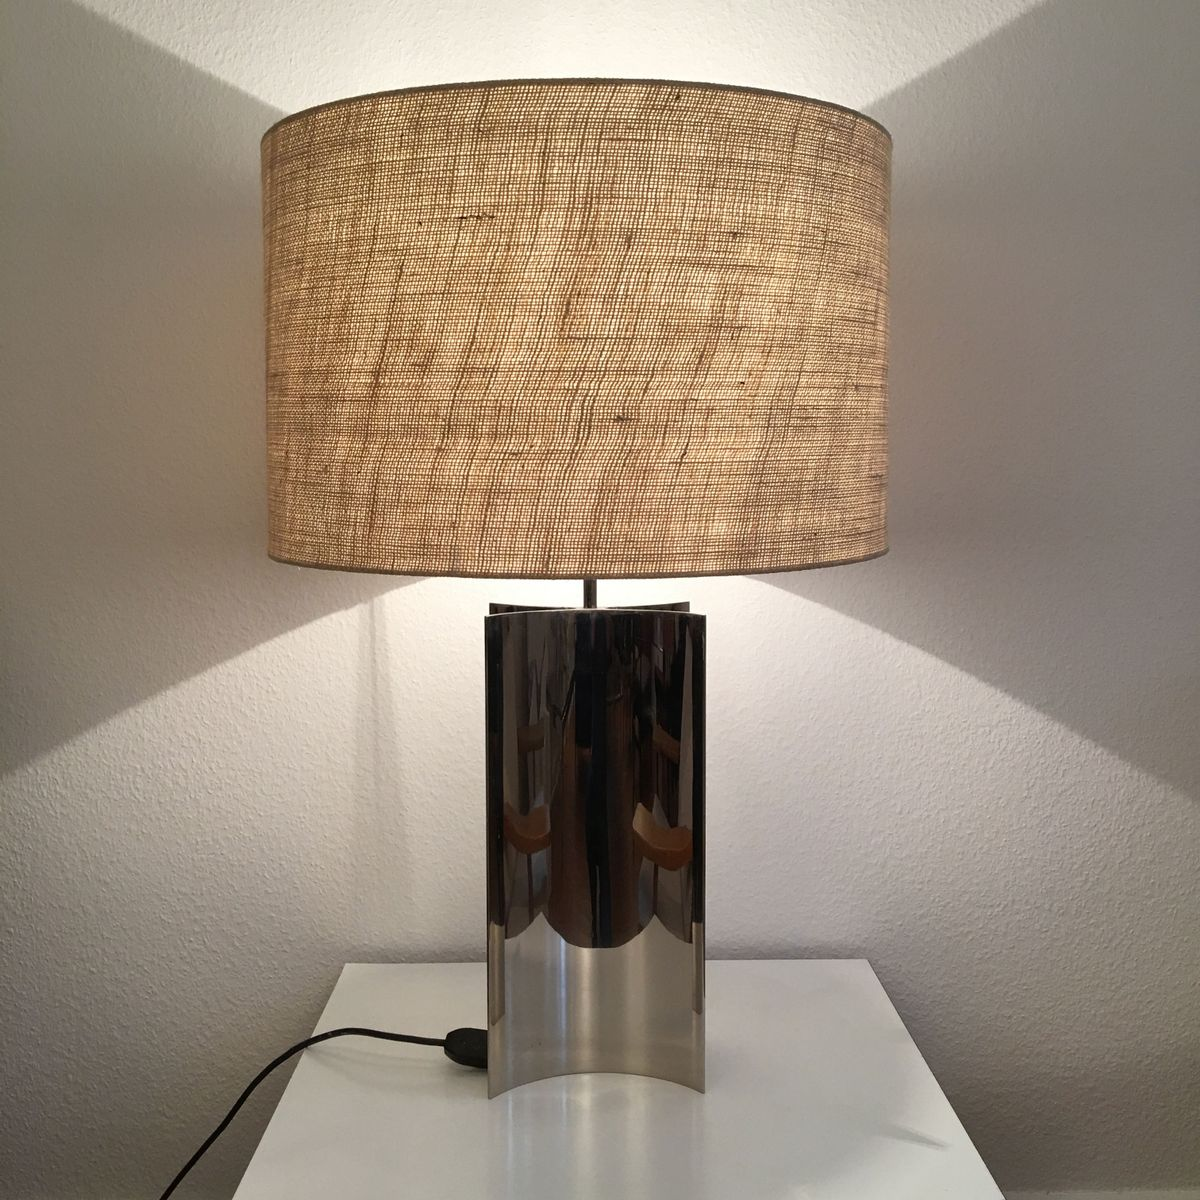 vintage metall lampe bei pamono kaufen. Black Bedroom Furniture Sets. Home Design Ideas